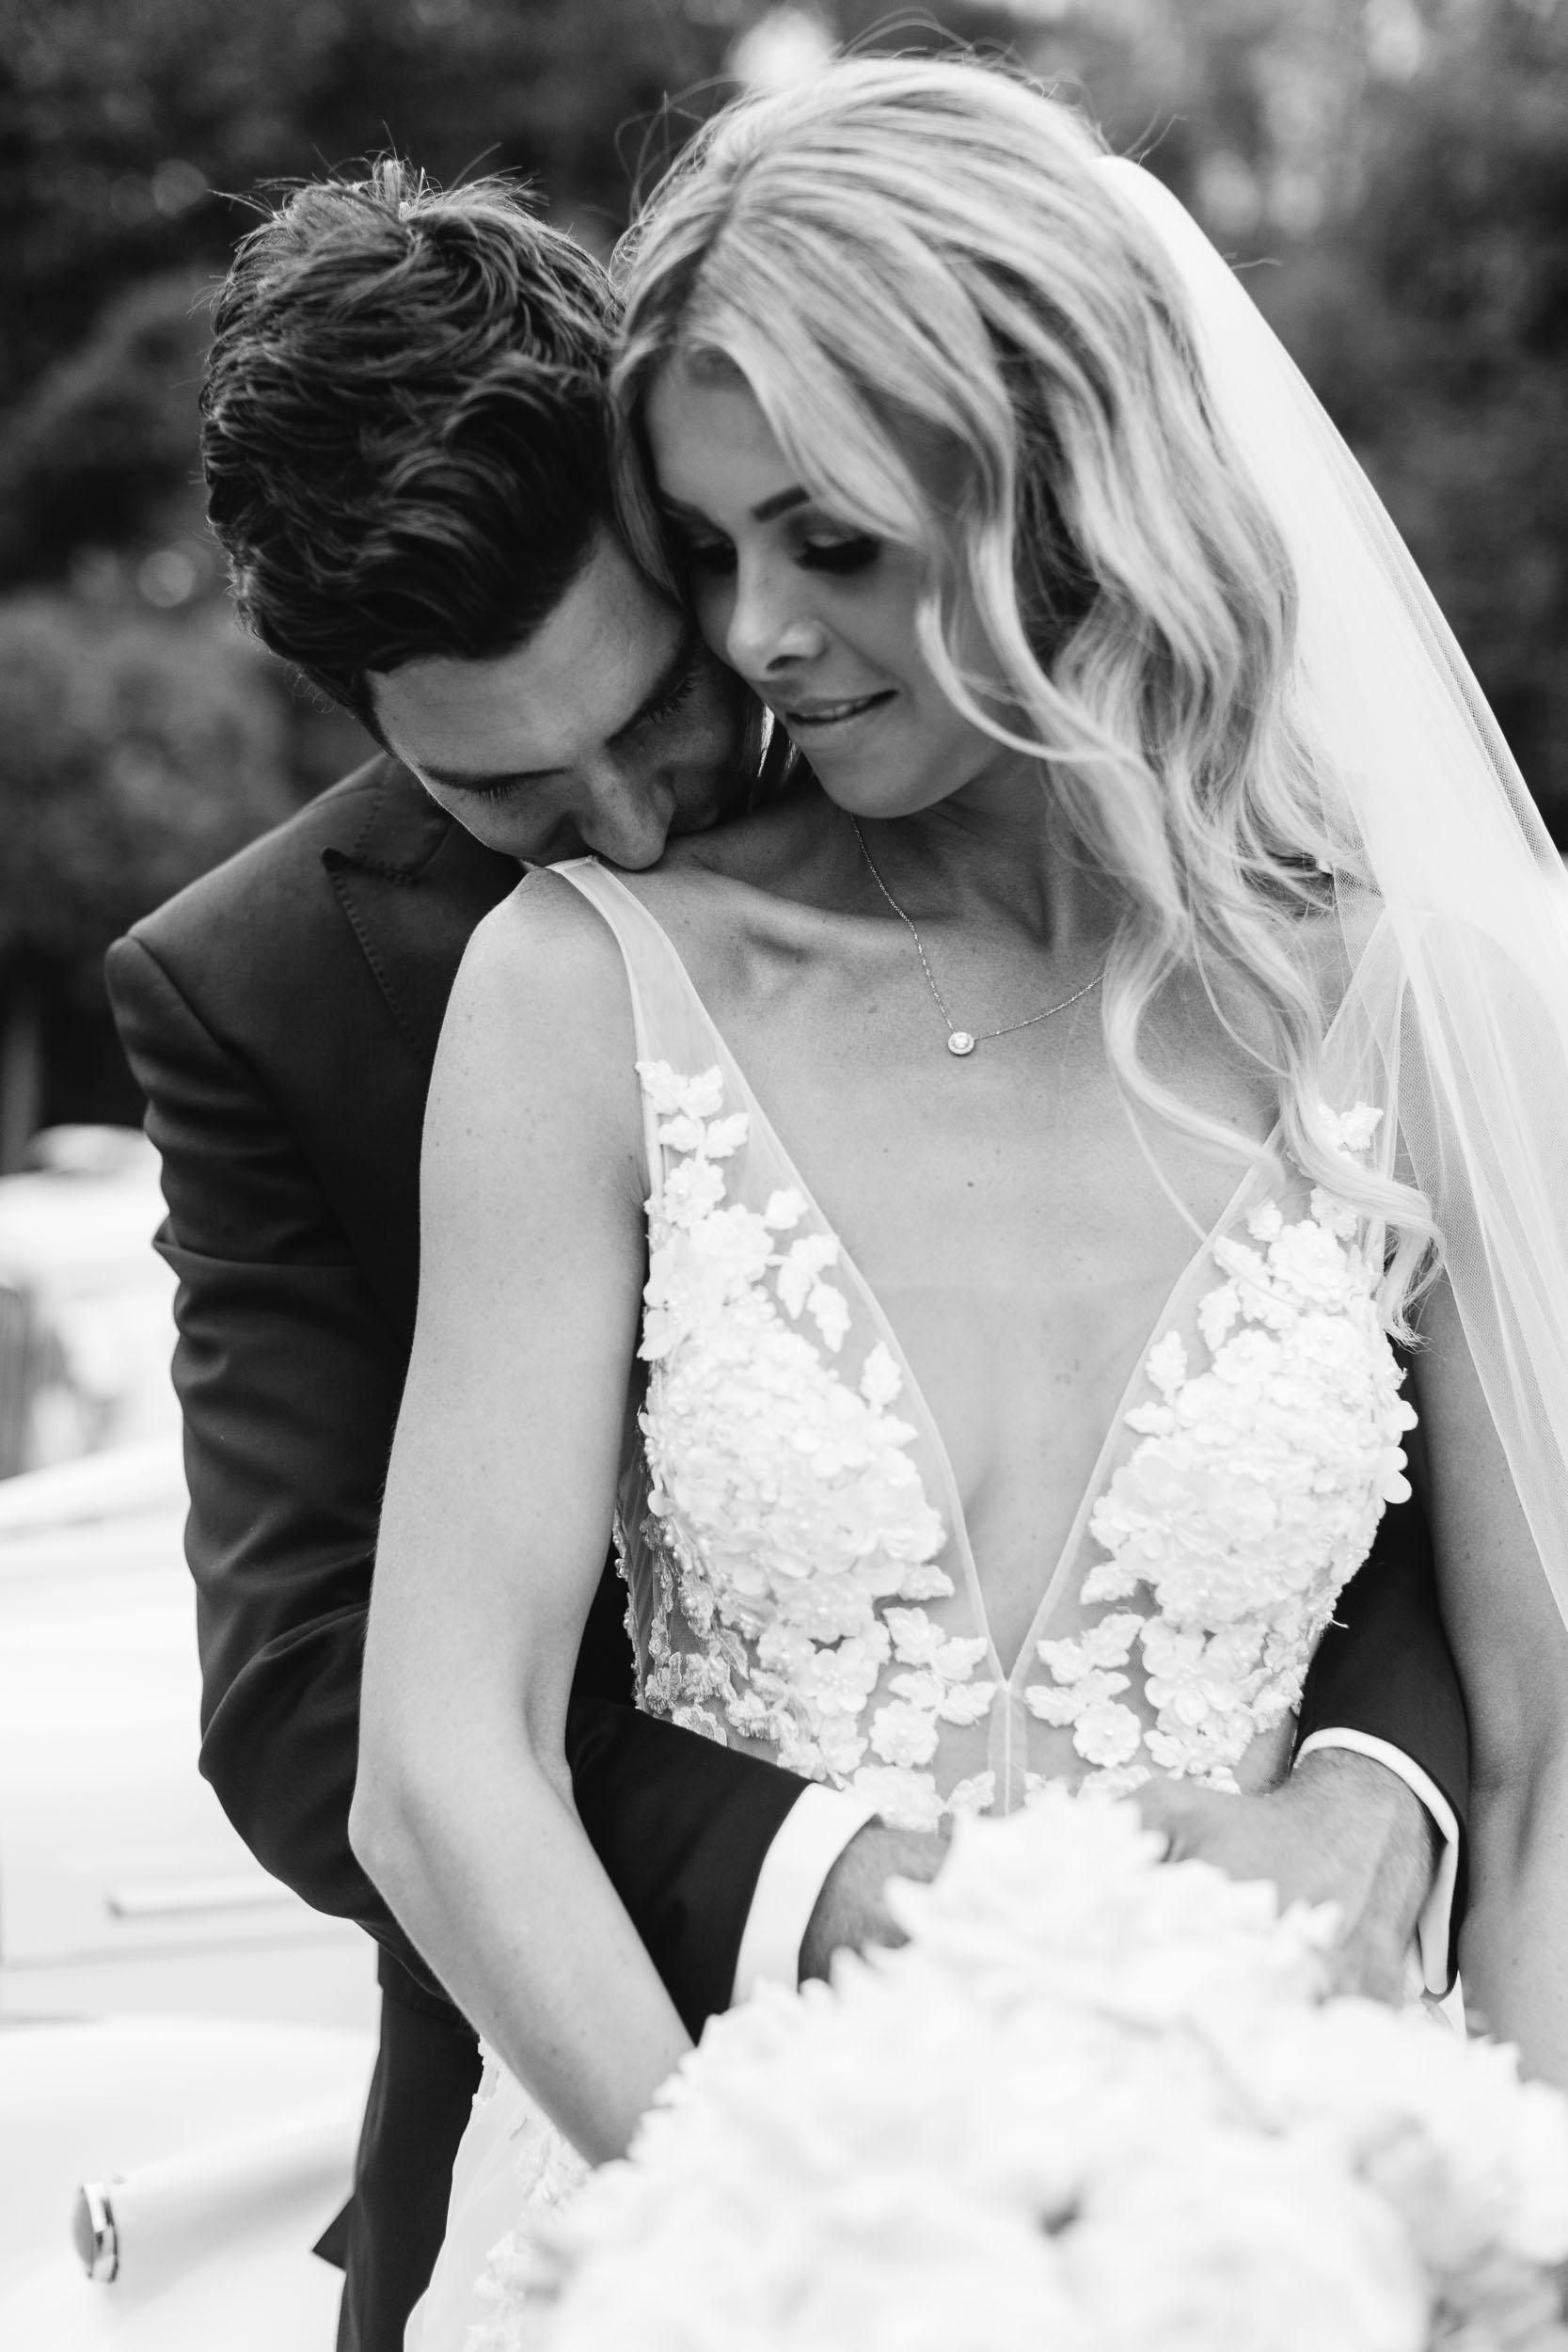 Kas-Richards-Mornington-Peninsula-Private-Property-Wedding-Marianna-Hardwick-Gown-459.jpg